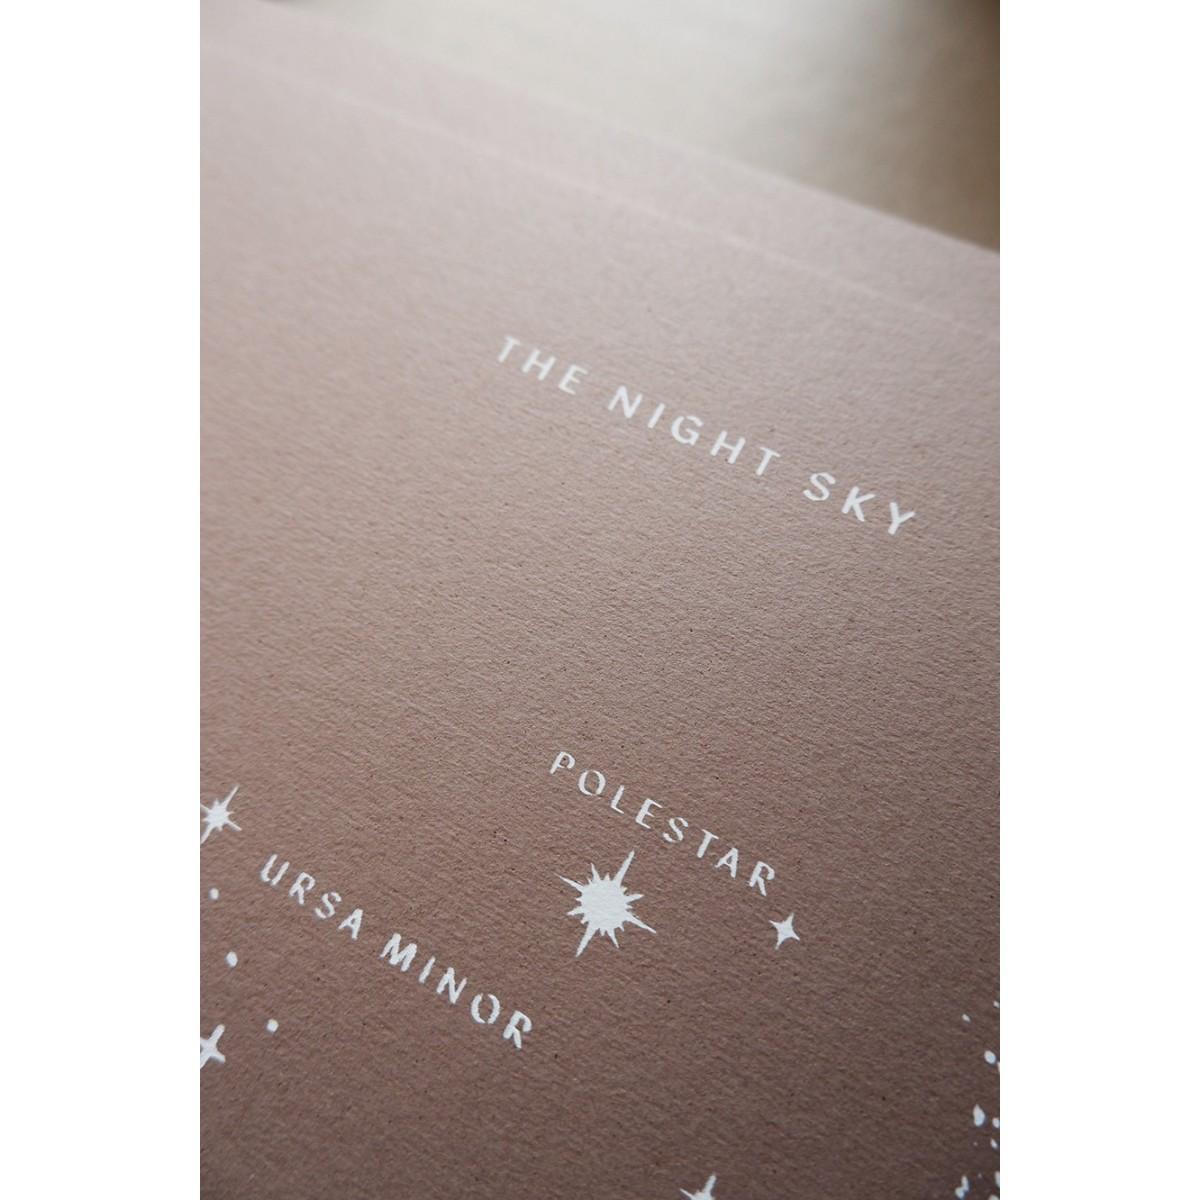 THE NIGHT SKY - A3 Print - Anna Cosma